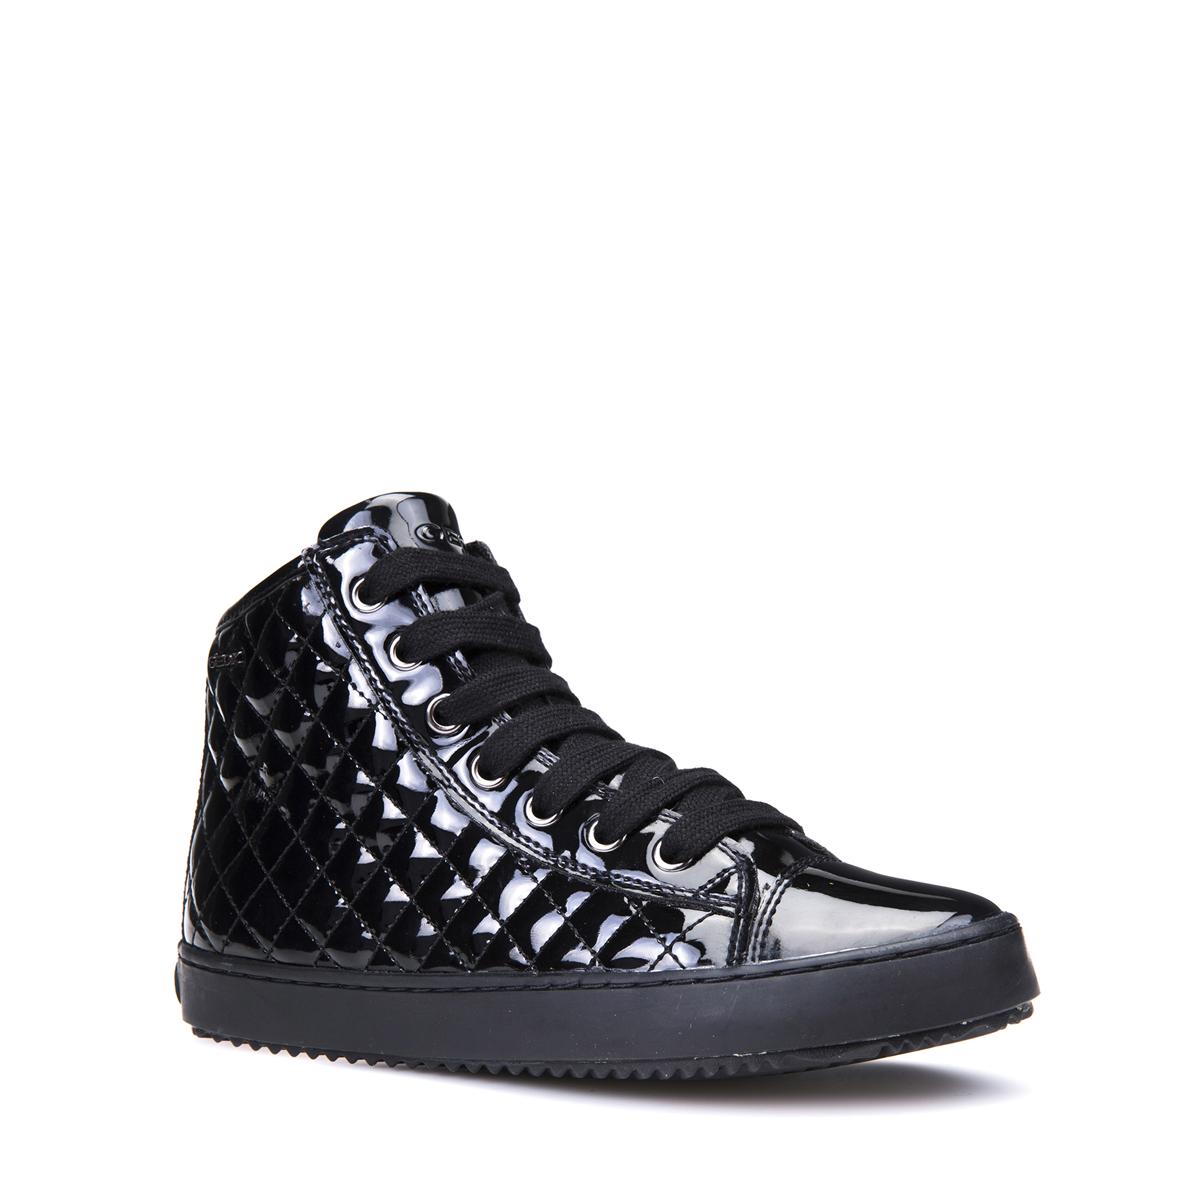 Geox Boots - Black - J744GF C9999 KALISPERA F 03aae9e598e6